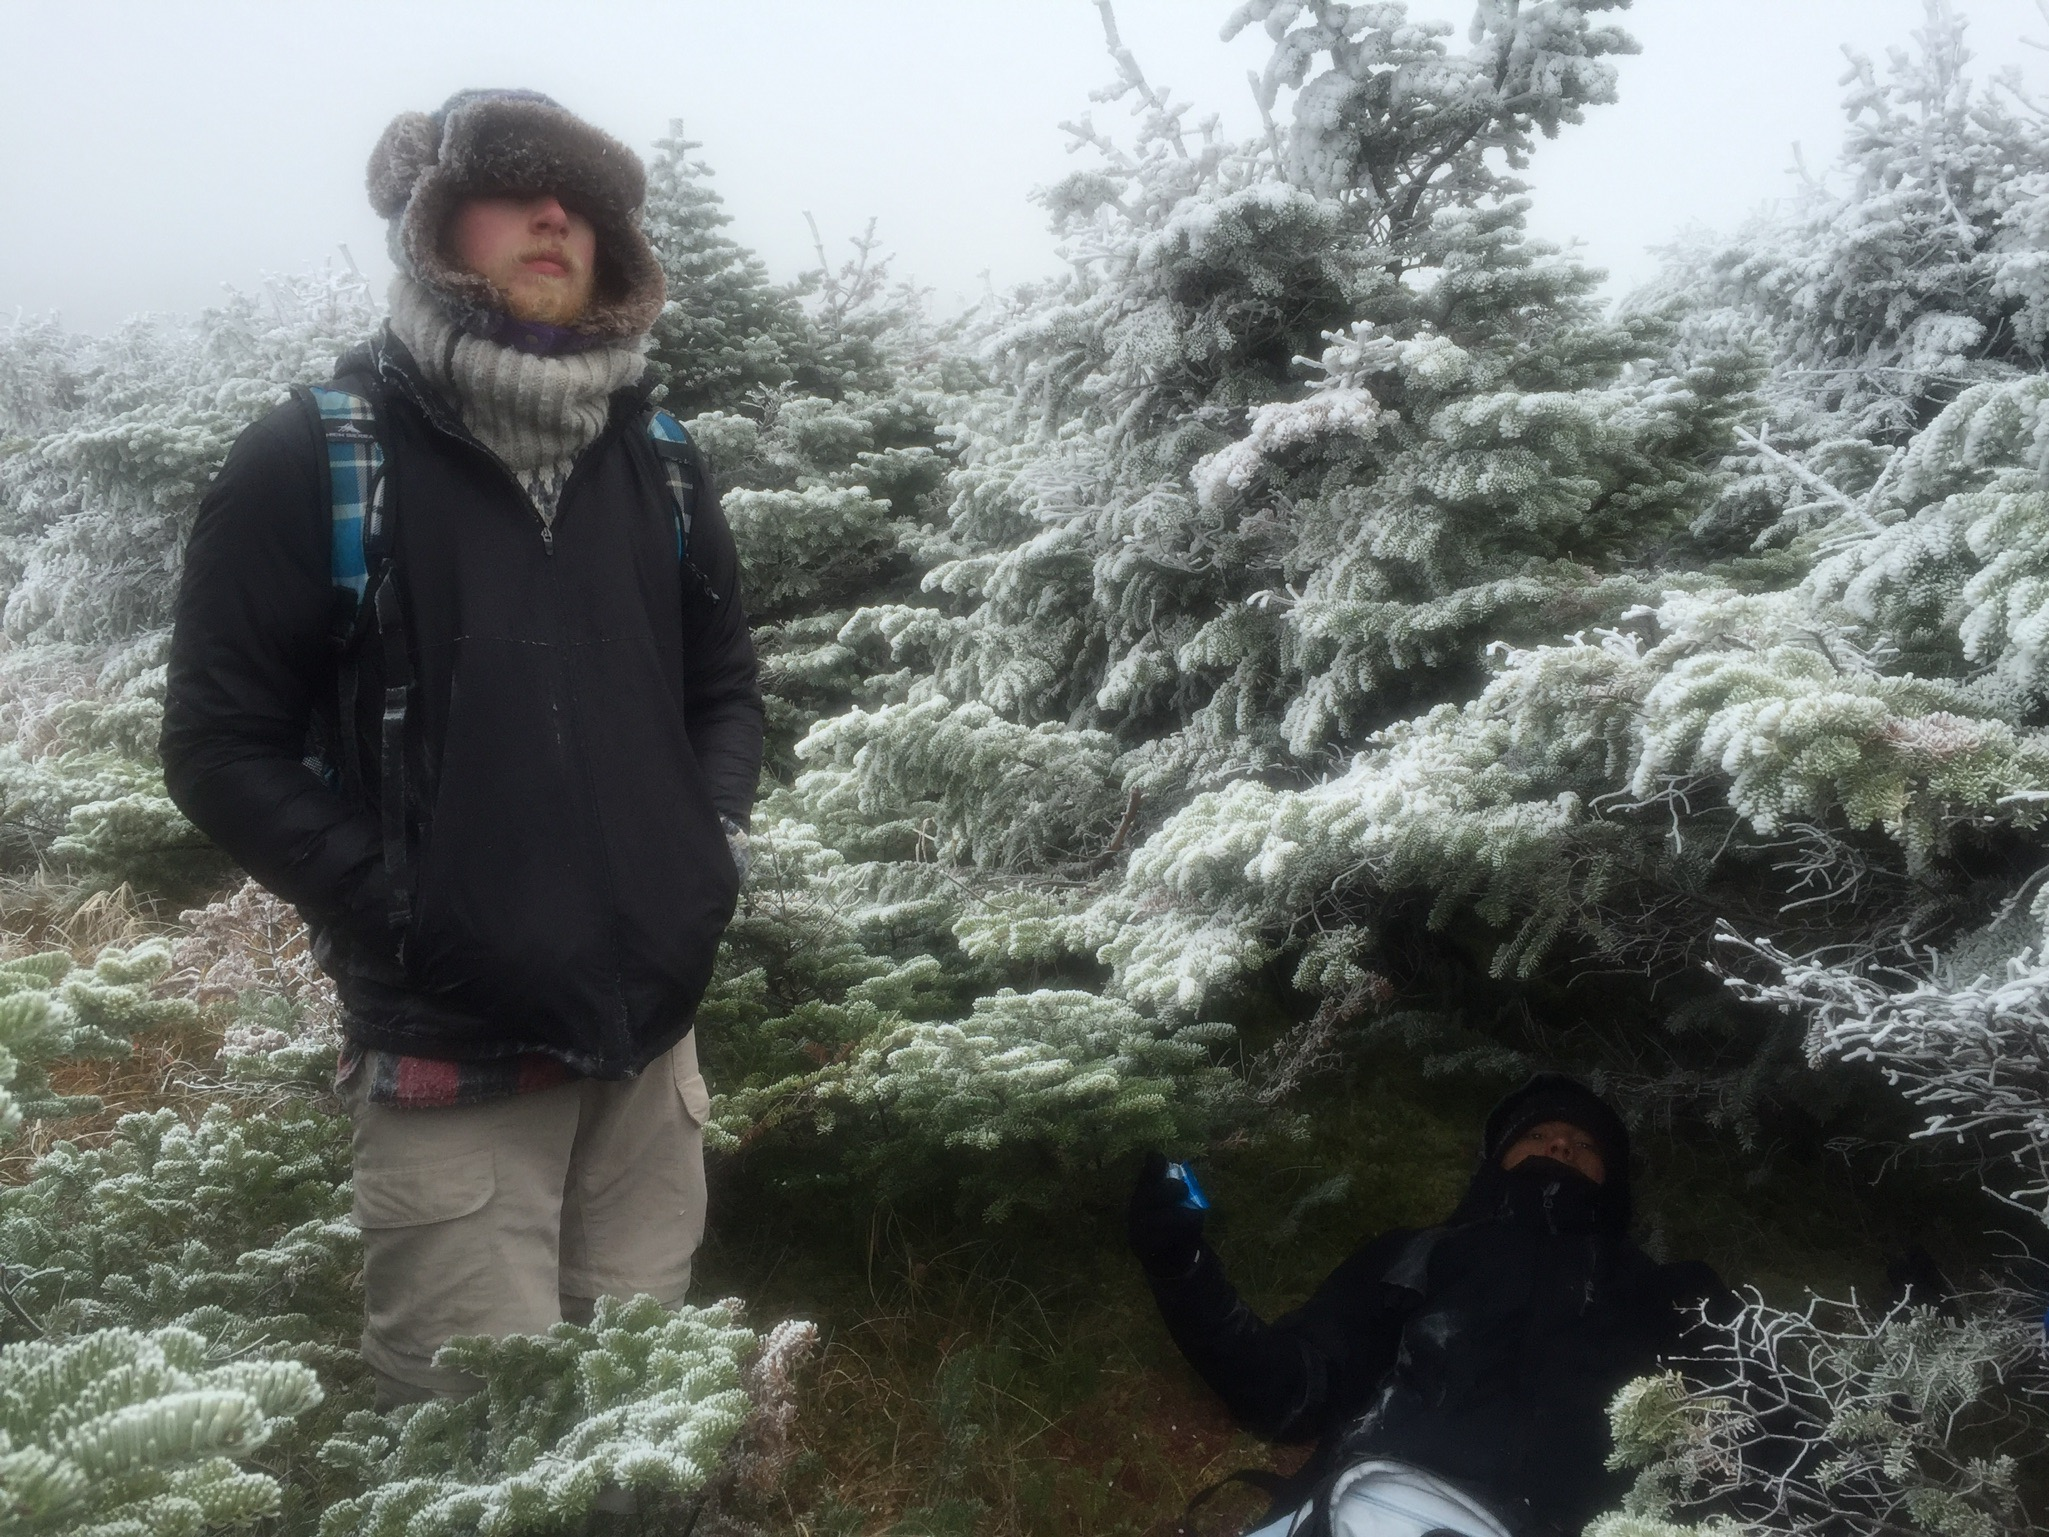 Taking shelter in a tree grove near Hamlin Peak.